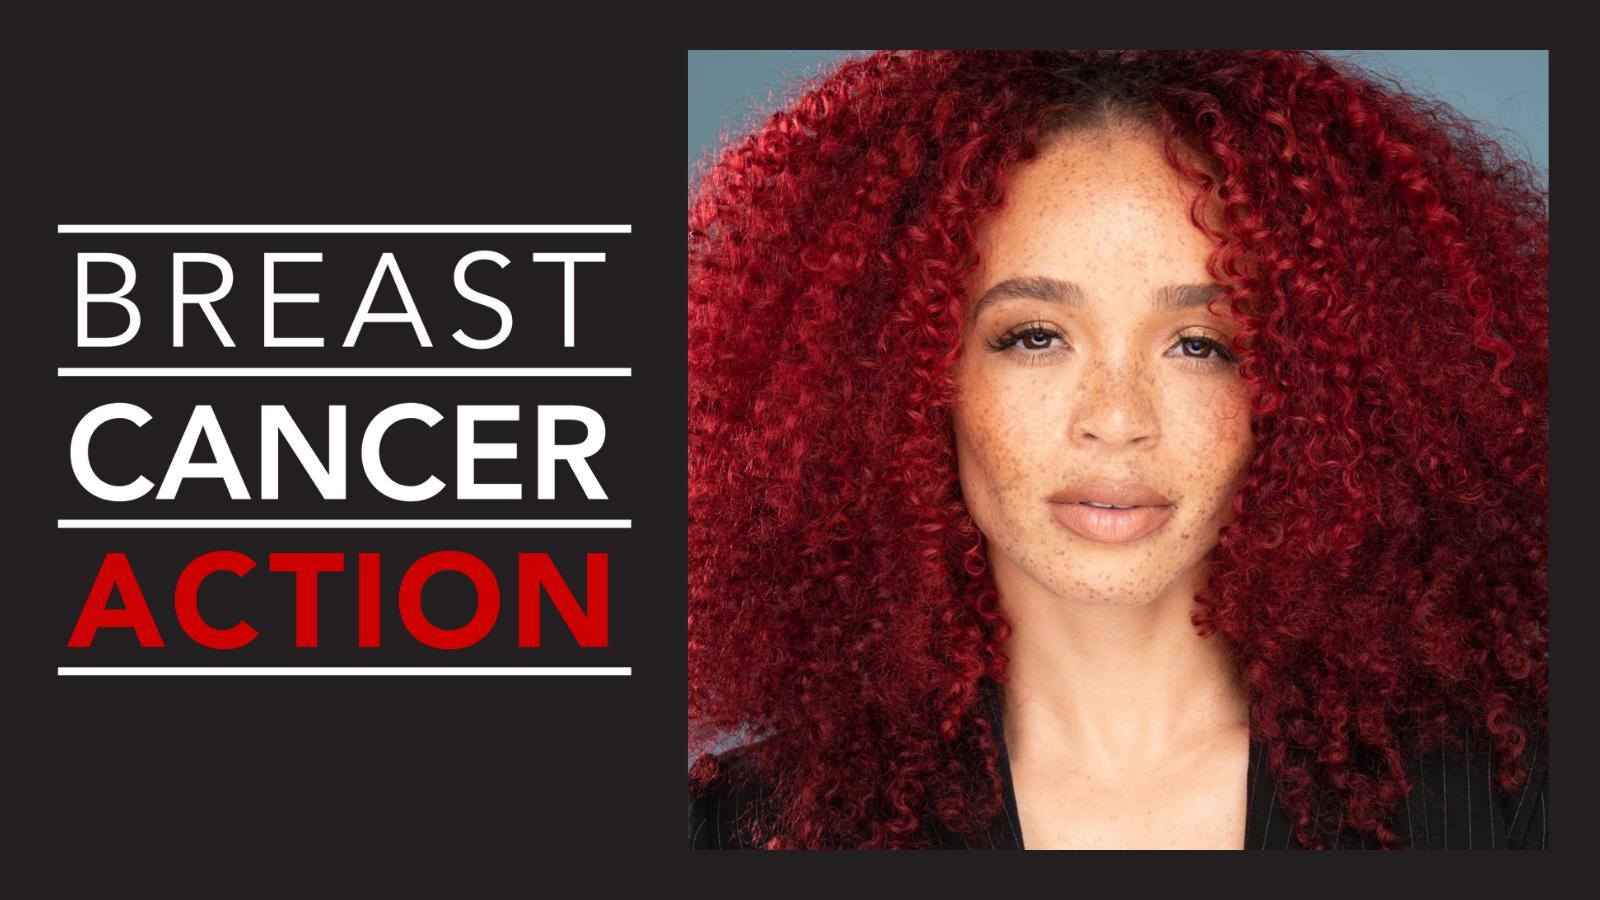 Krystal Redman and Breast Cancer Action Logo